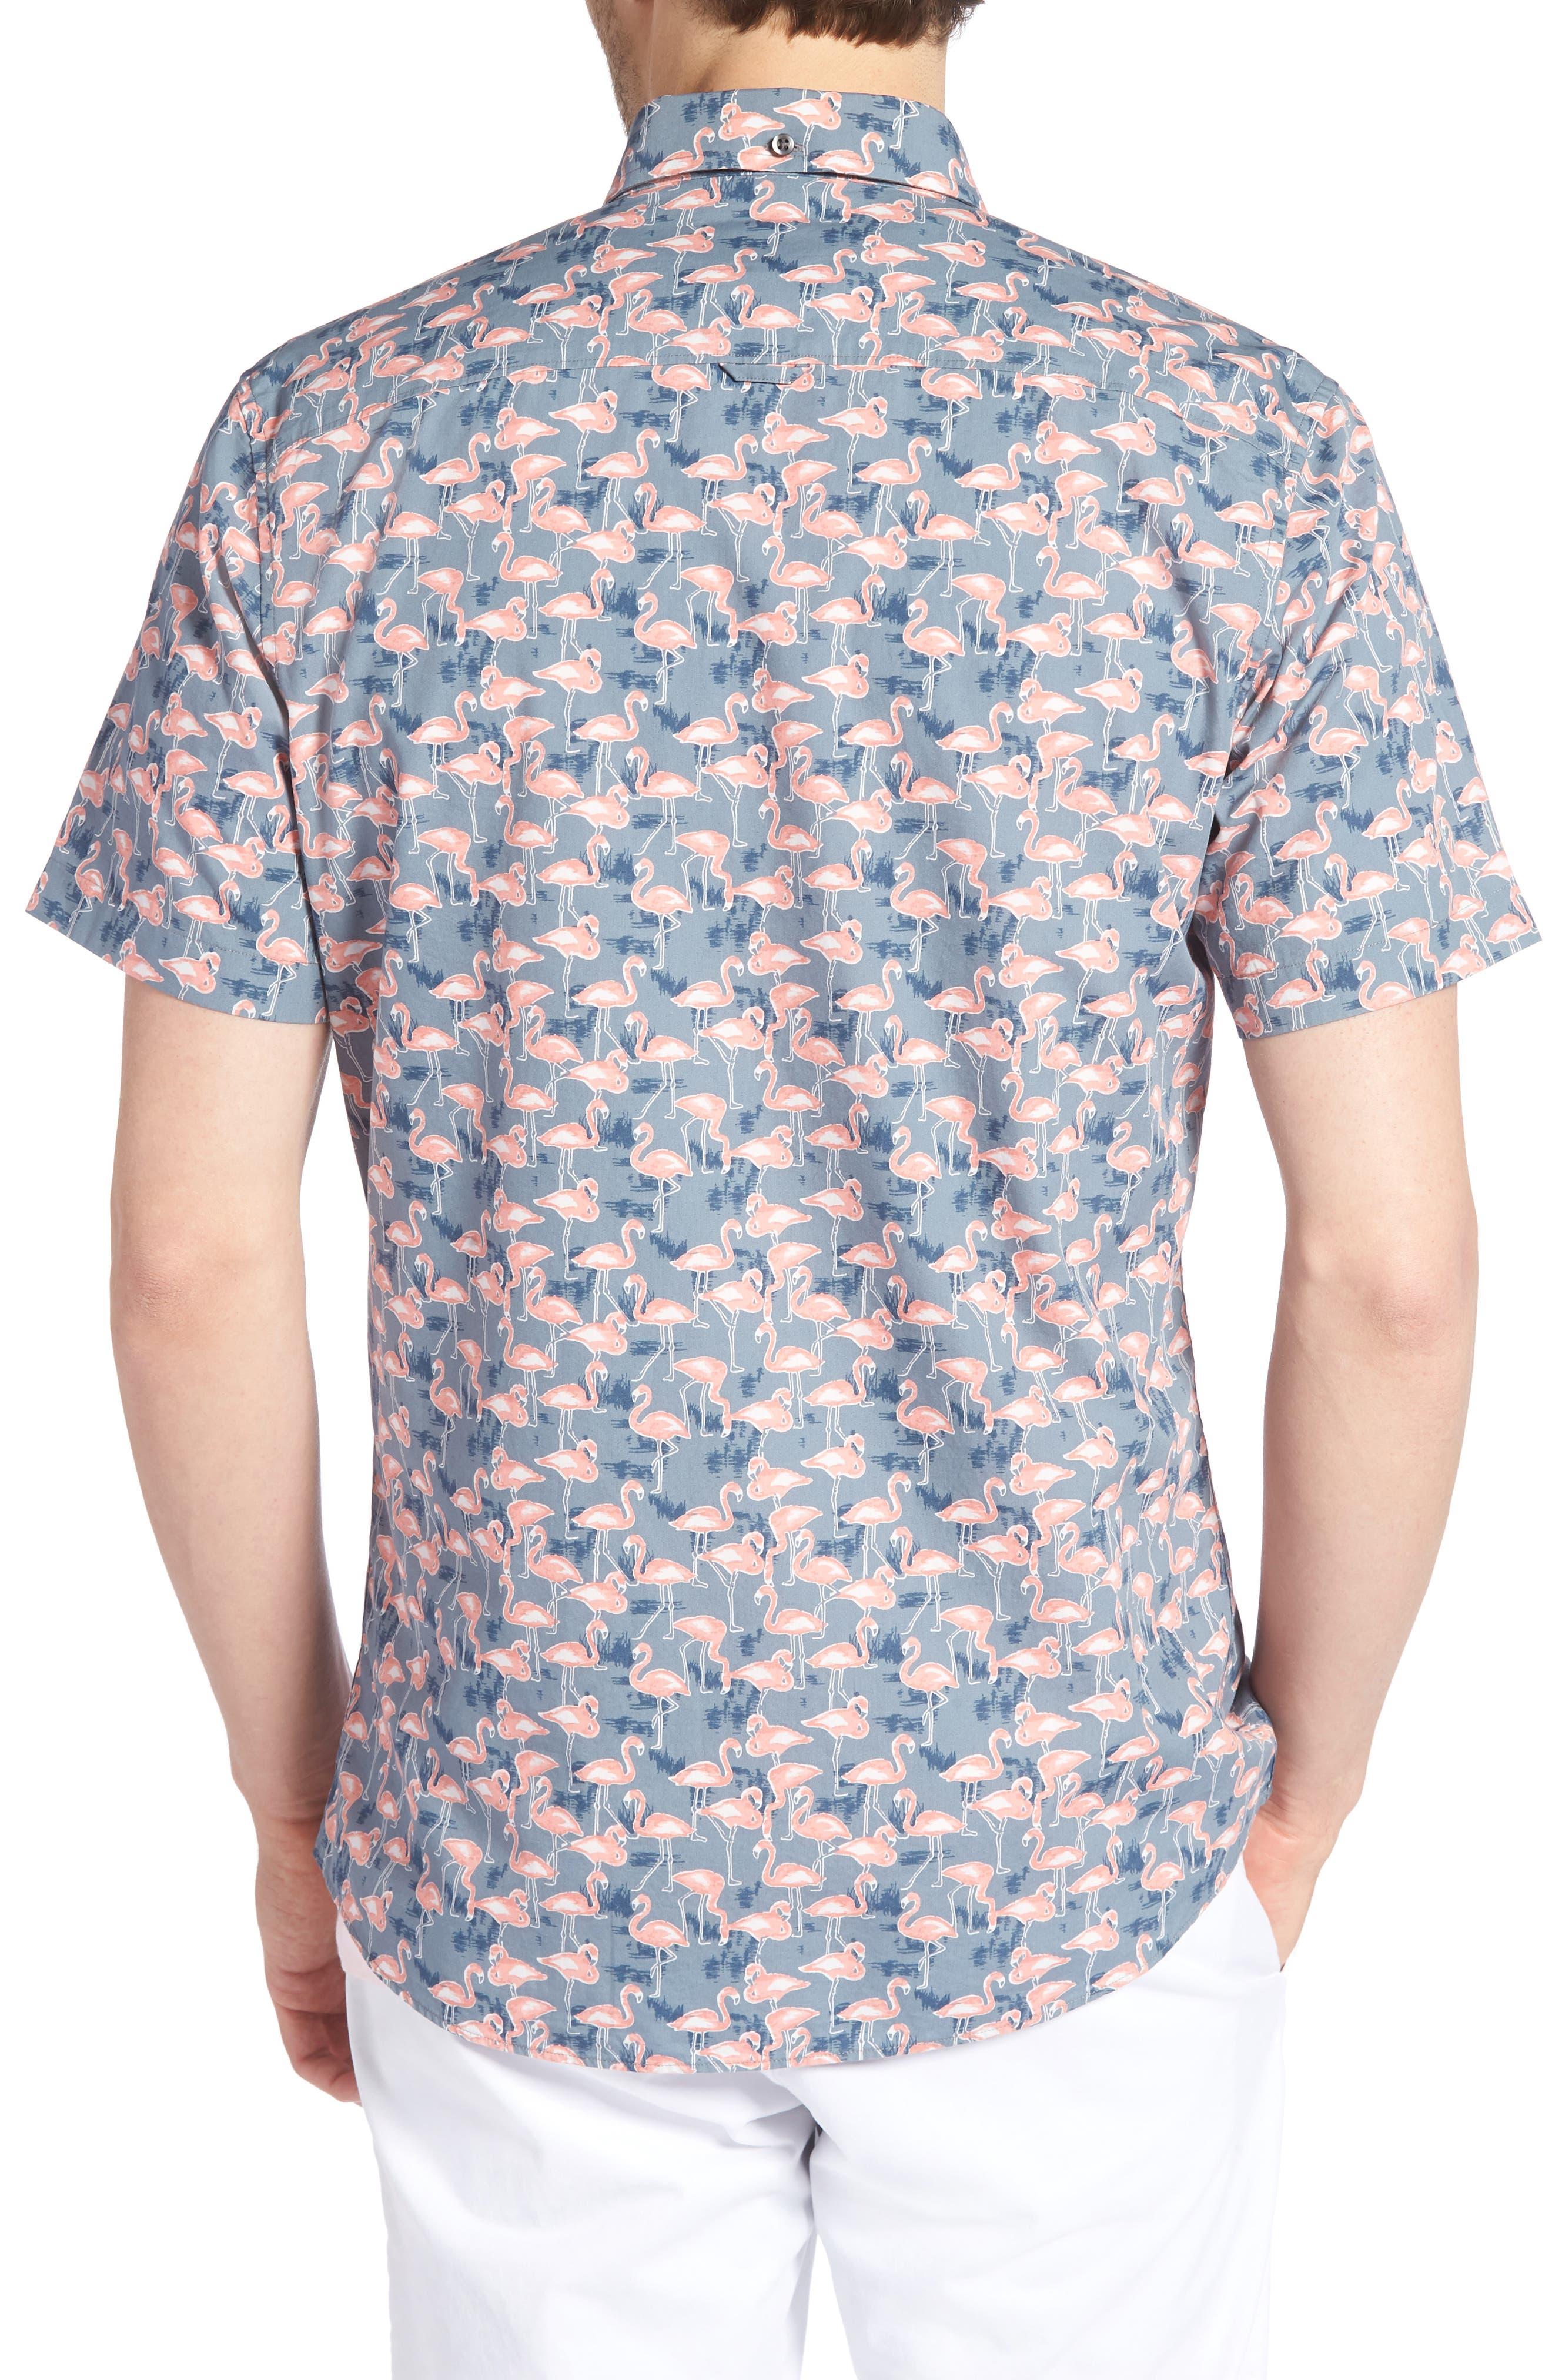 Trim Fit Print Short Sleeve Sport Shirt,                             Alternate thumbnail 2, color,                             GREY GRISALLE PINK FLAMINGOS